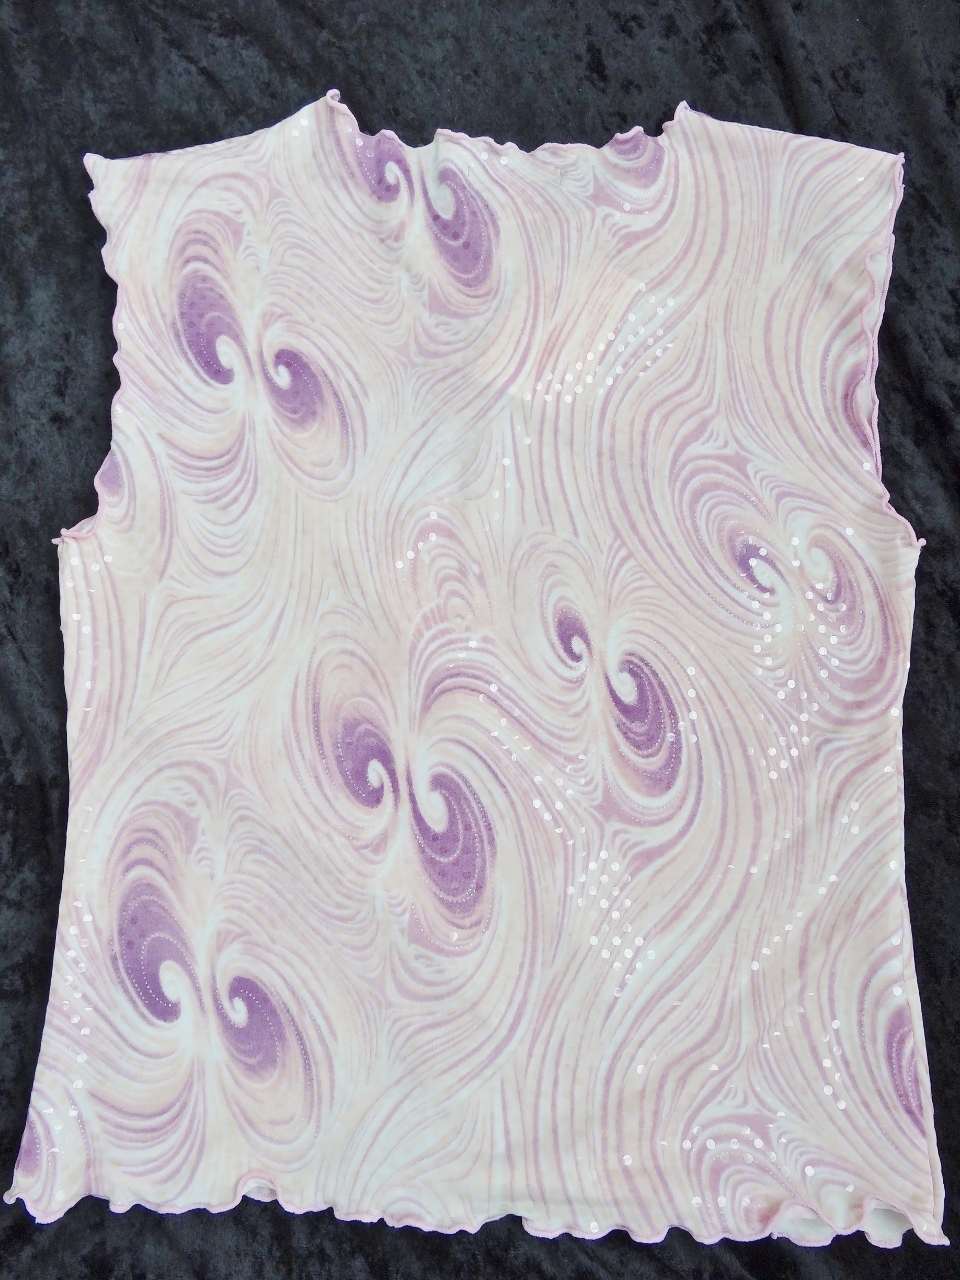 BEBE Lavender/Pink Sequin Top Medium  NWT